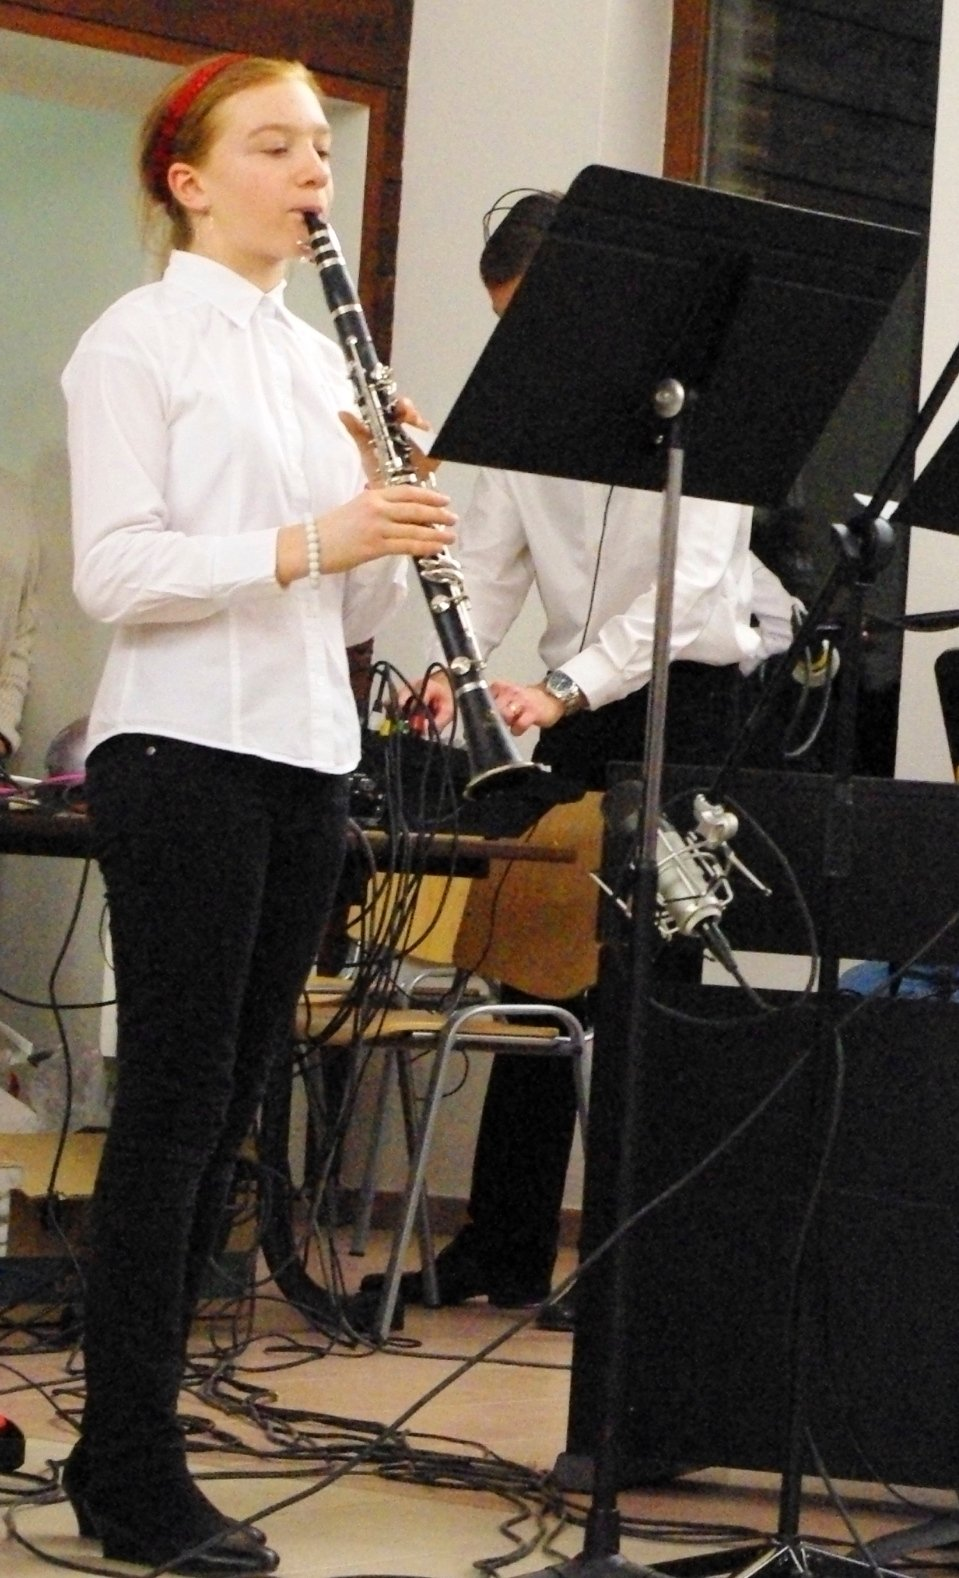 Soirée musicale, salle Robert Hazebrouck à Beuvry dans Festivités audition-24-02-2012-01